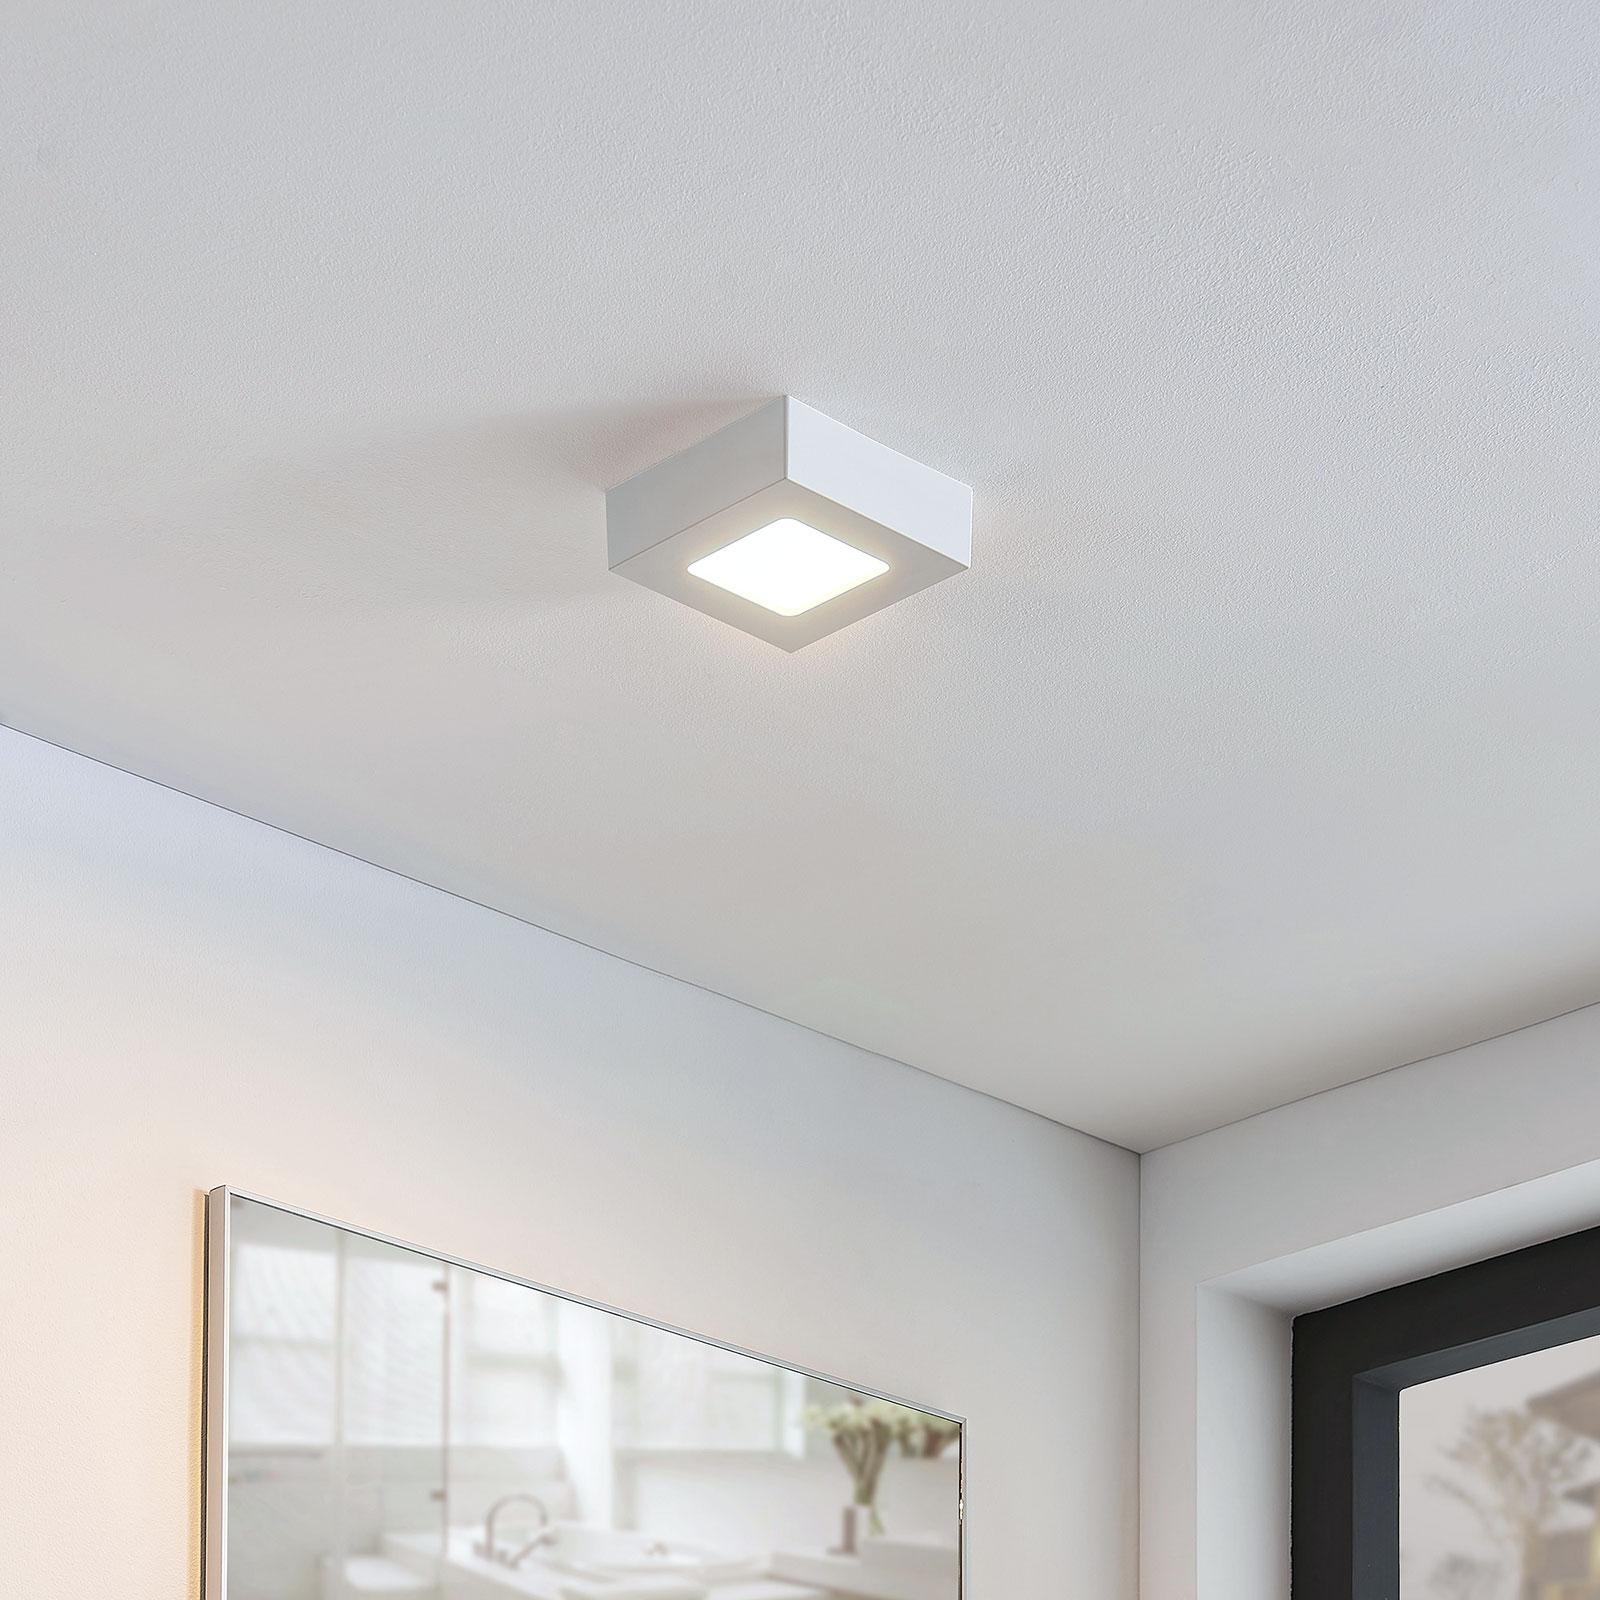 LED-Deckenlampe Marlo weiß 3000K eckig 12,8cm